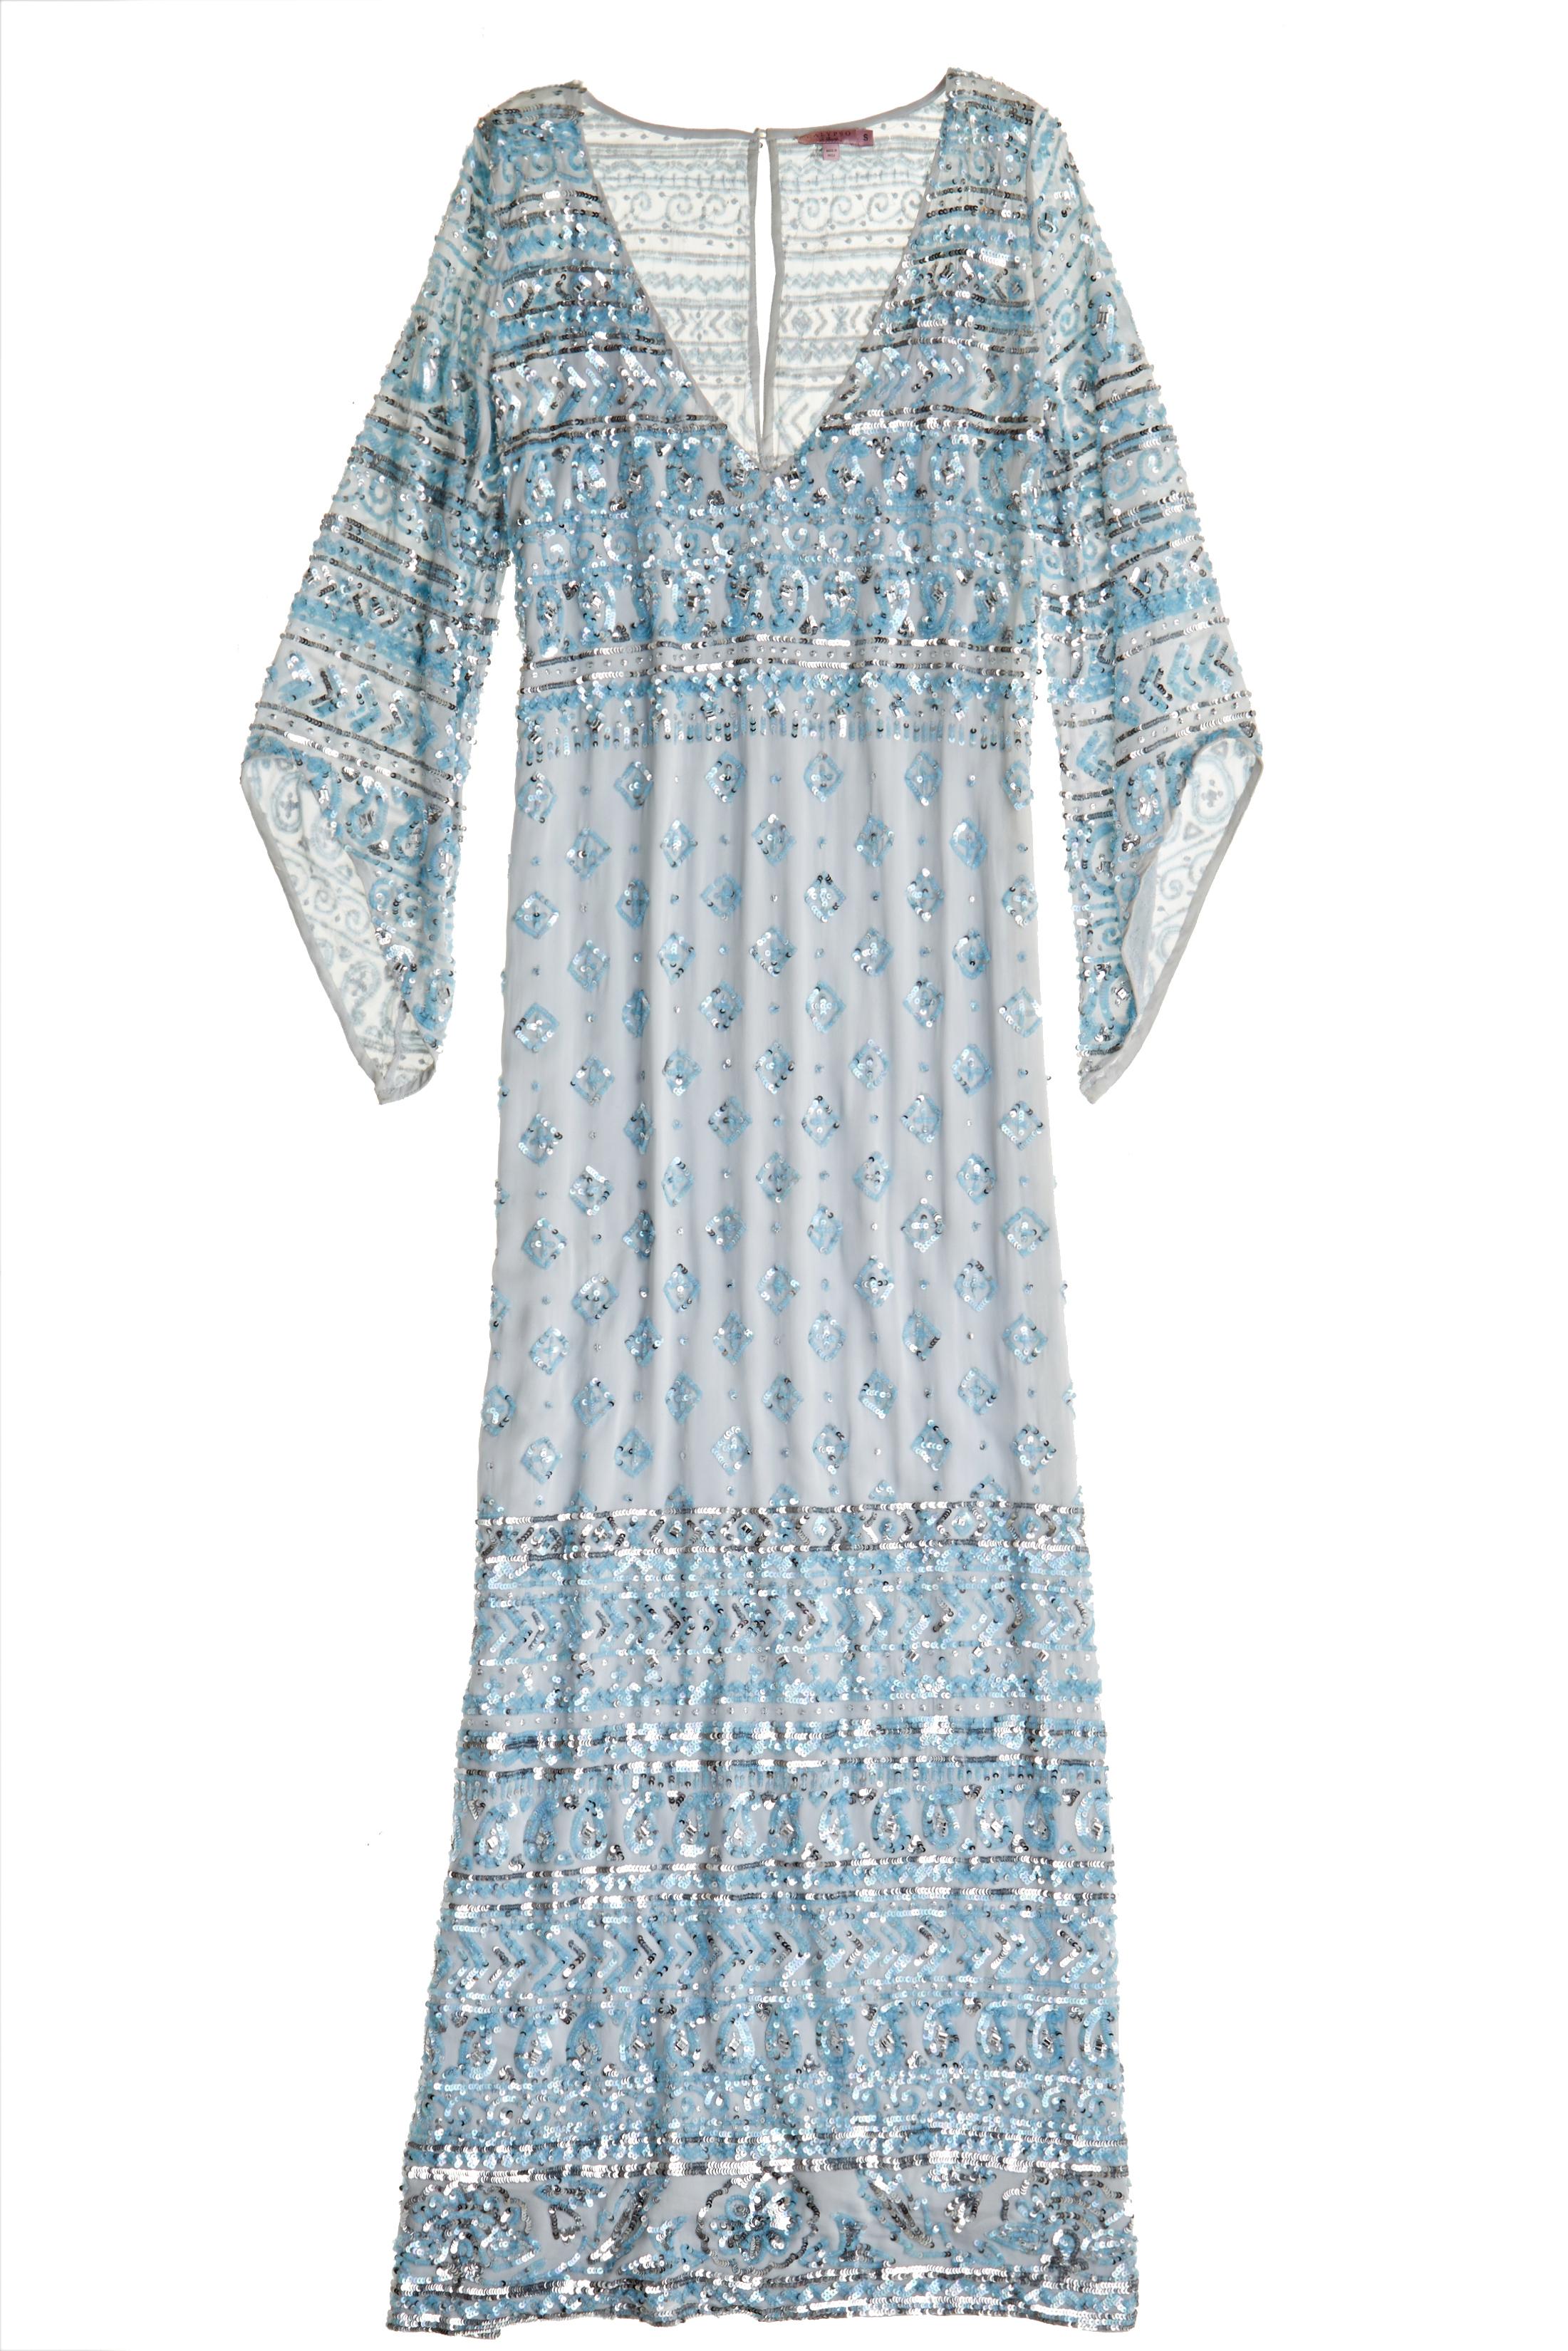 calypso-st-barth-bridal-hajari-dress-0315.jpg